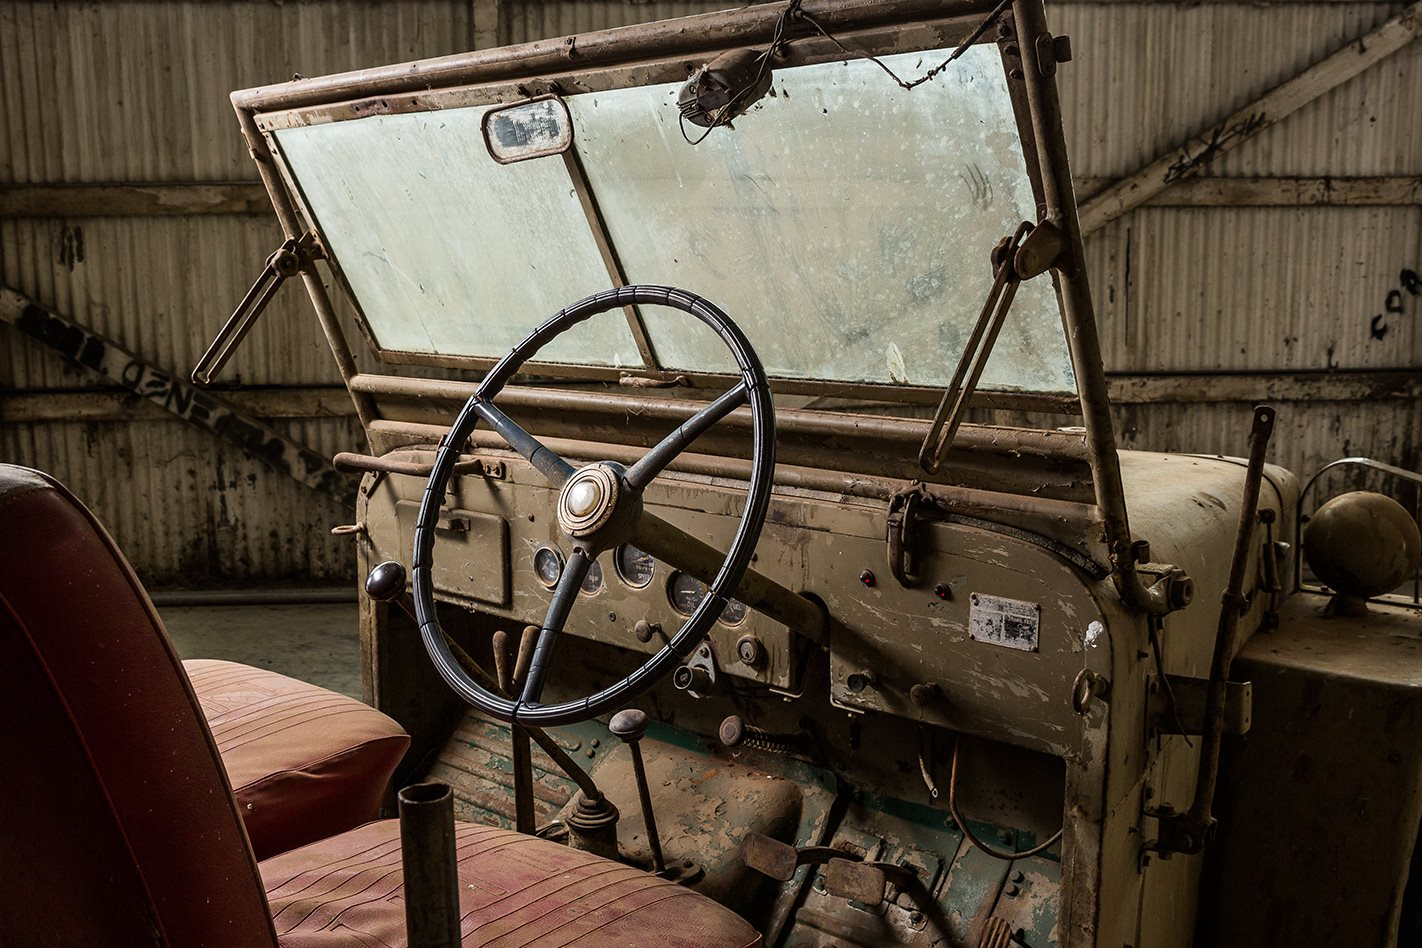 Toyota BJ FJ Land Cruiser interior